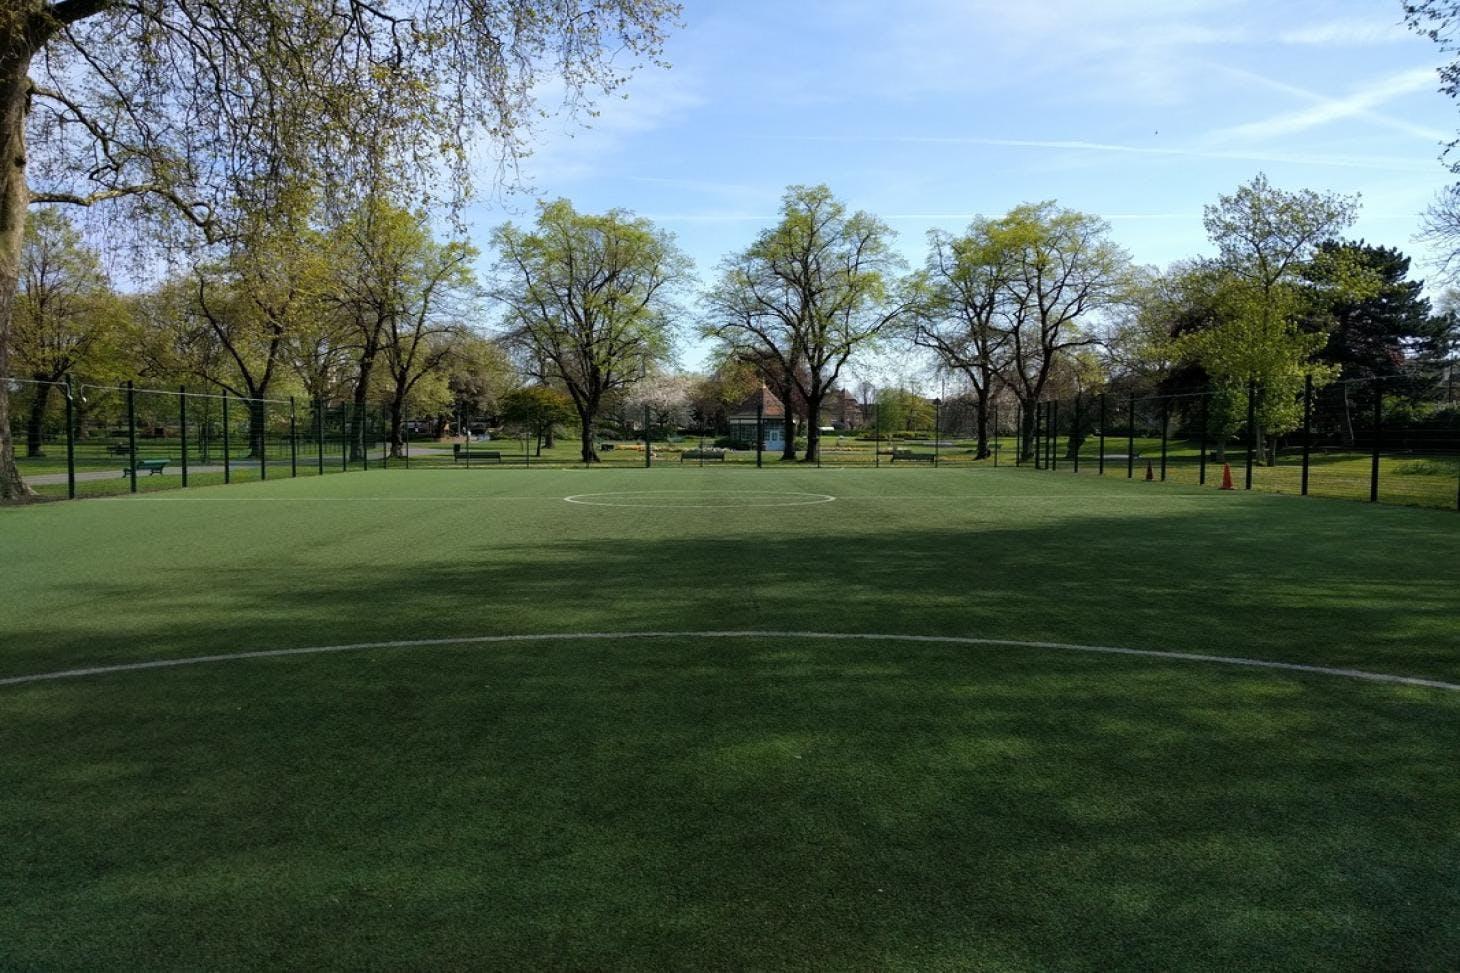 Myatts Fields Park 7 a side | 3G Astroturf football pitch